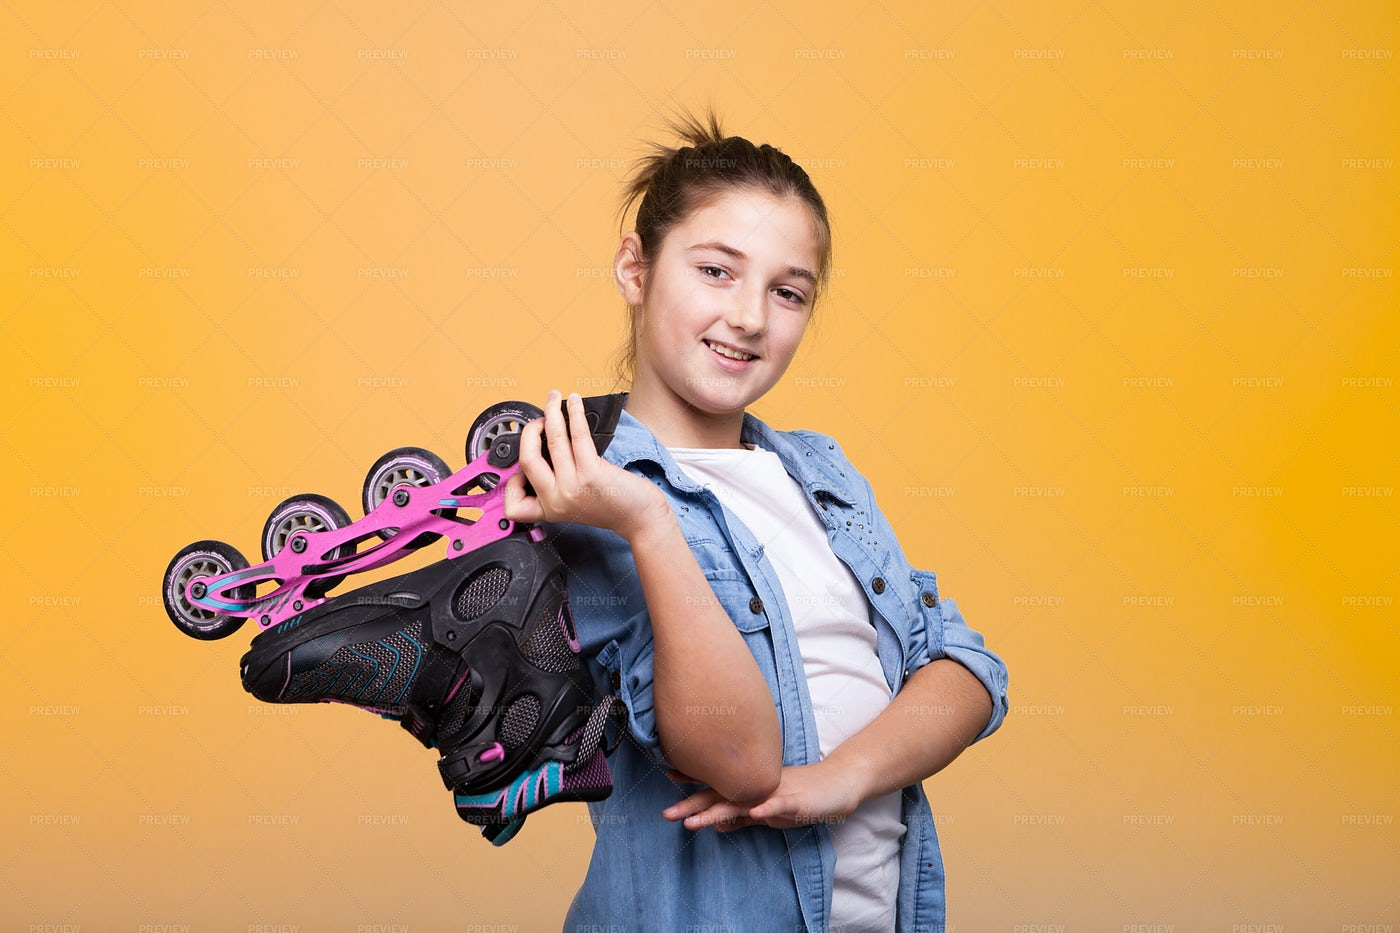 Girl With A Roller Skate: Stock Photos